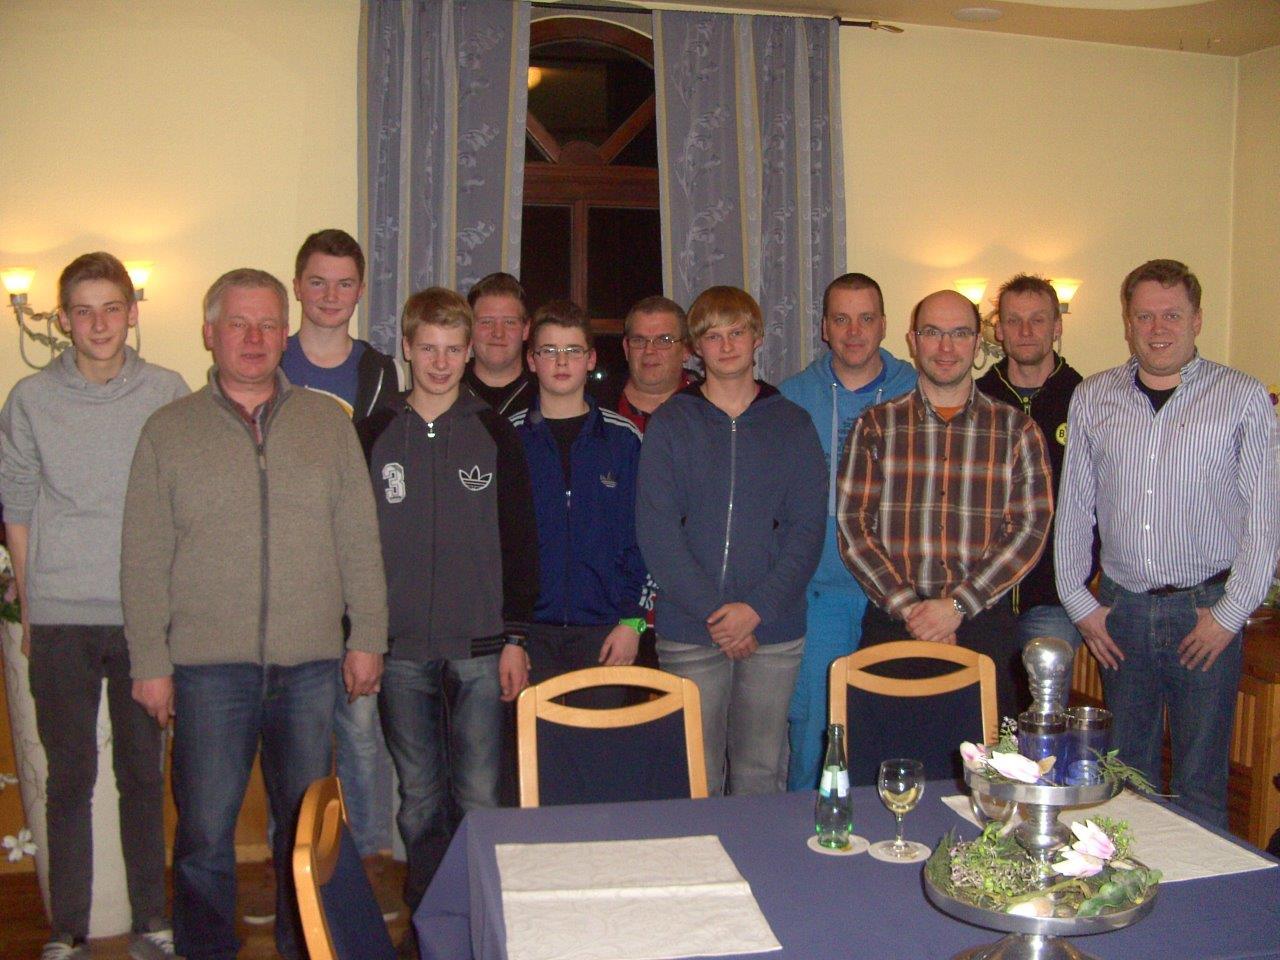 AWL 2013 in Meppen